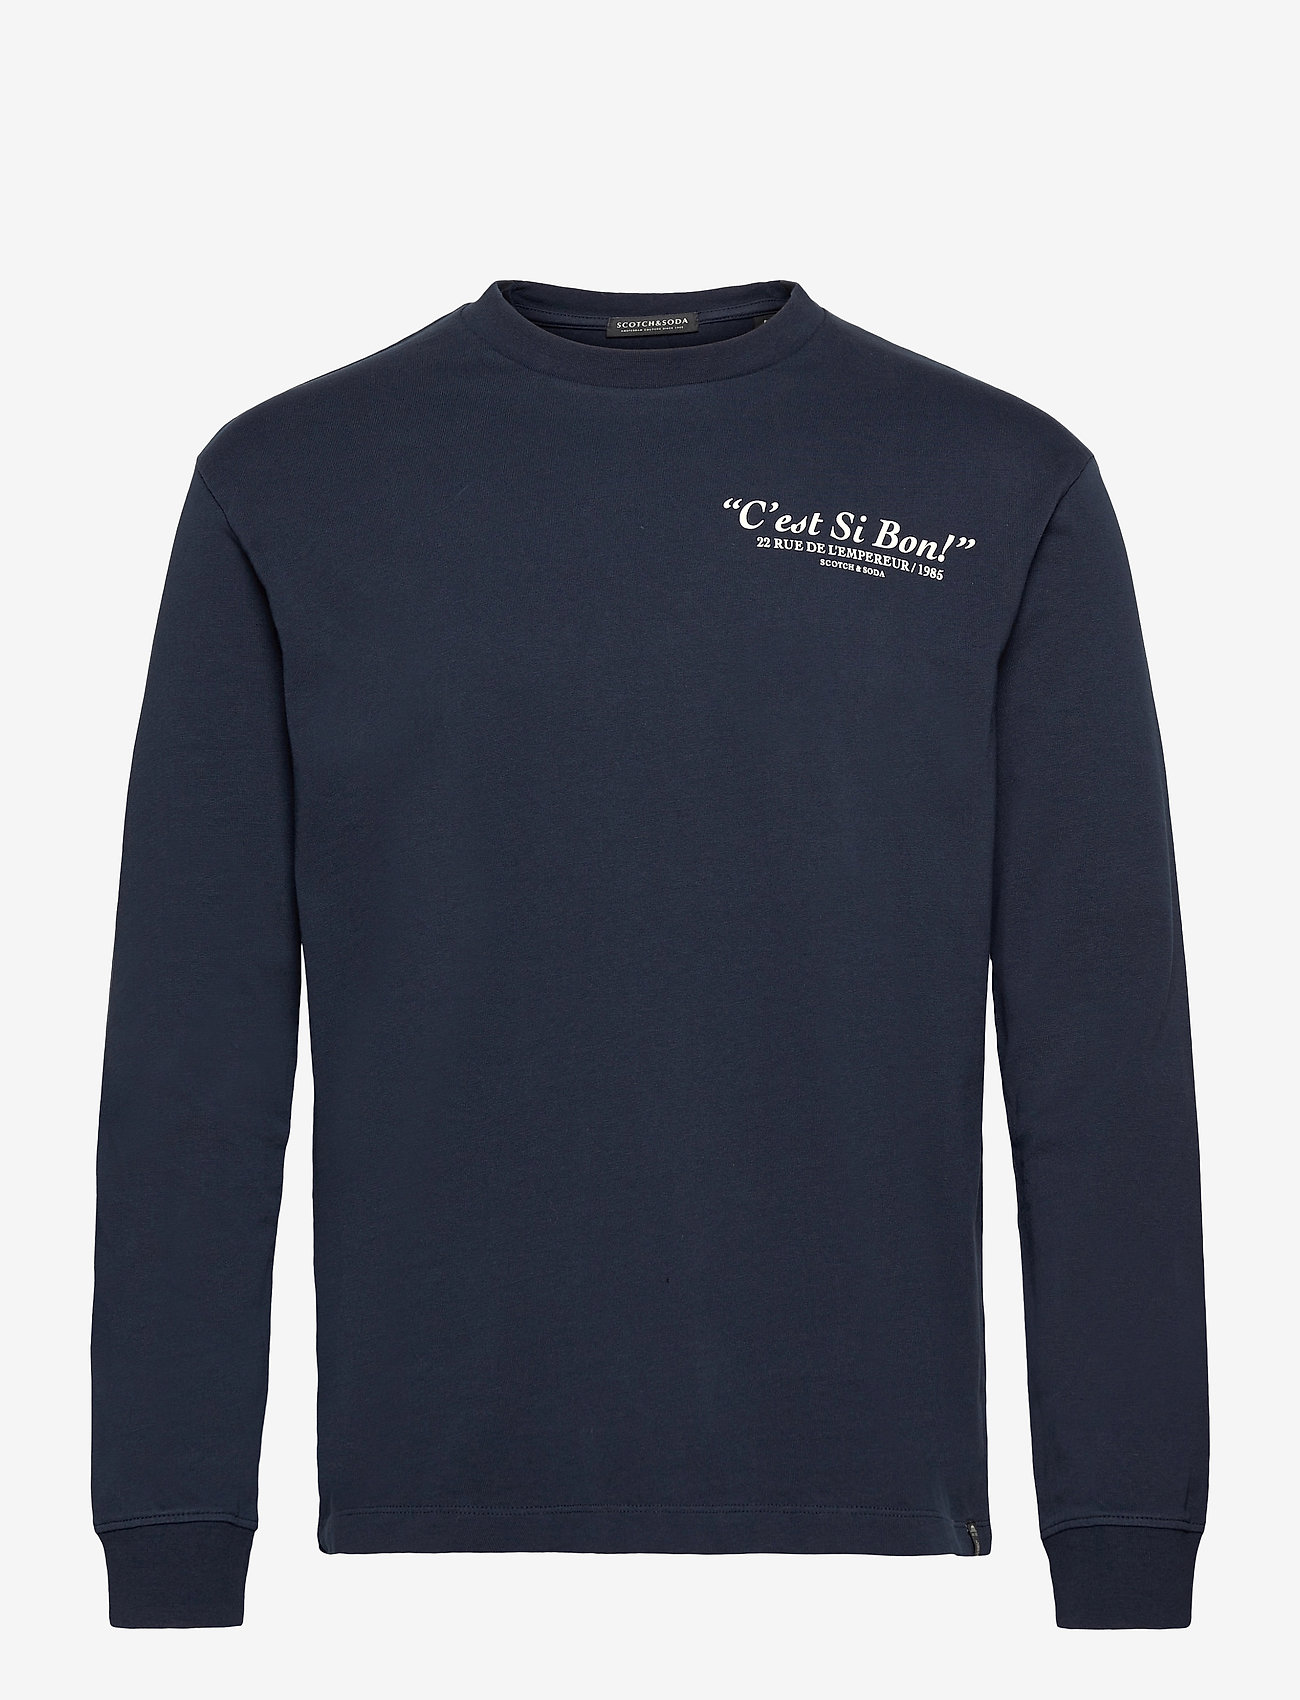 Scotch & Soda - Organic cotton-jersey longsleeve artwork tee - podstawowe koszulki - night - 0